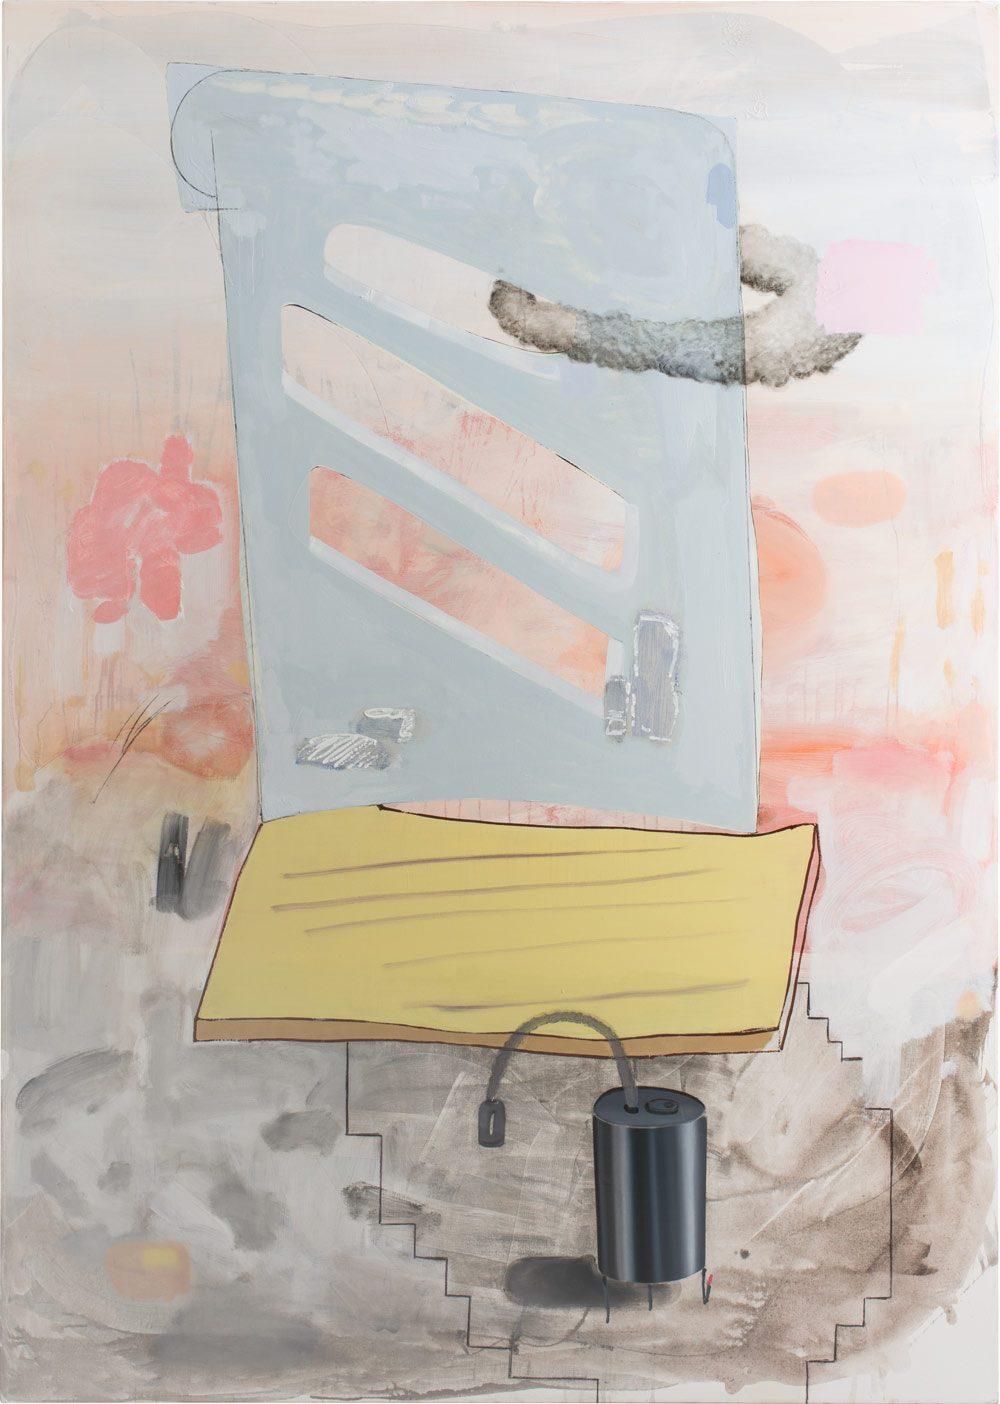 o.T. 54 (2017), Öl, Lack, Kohle auf Leinwand, 280 x 200 cm